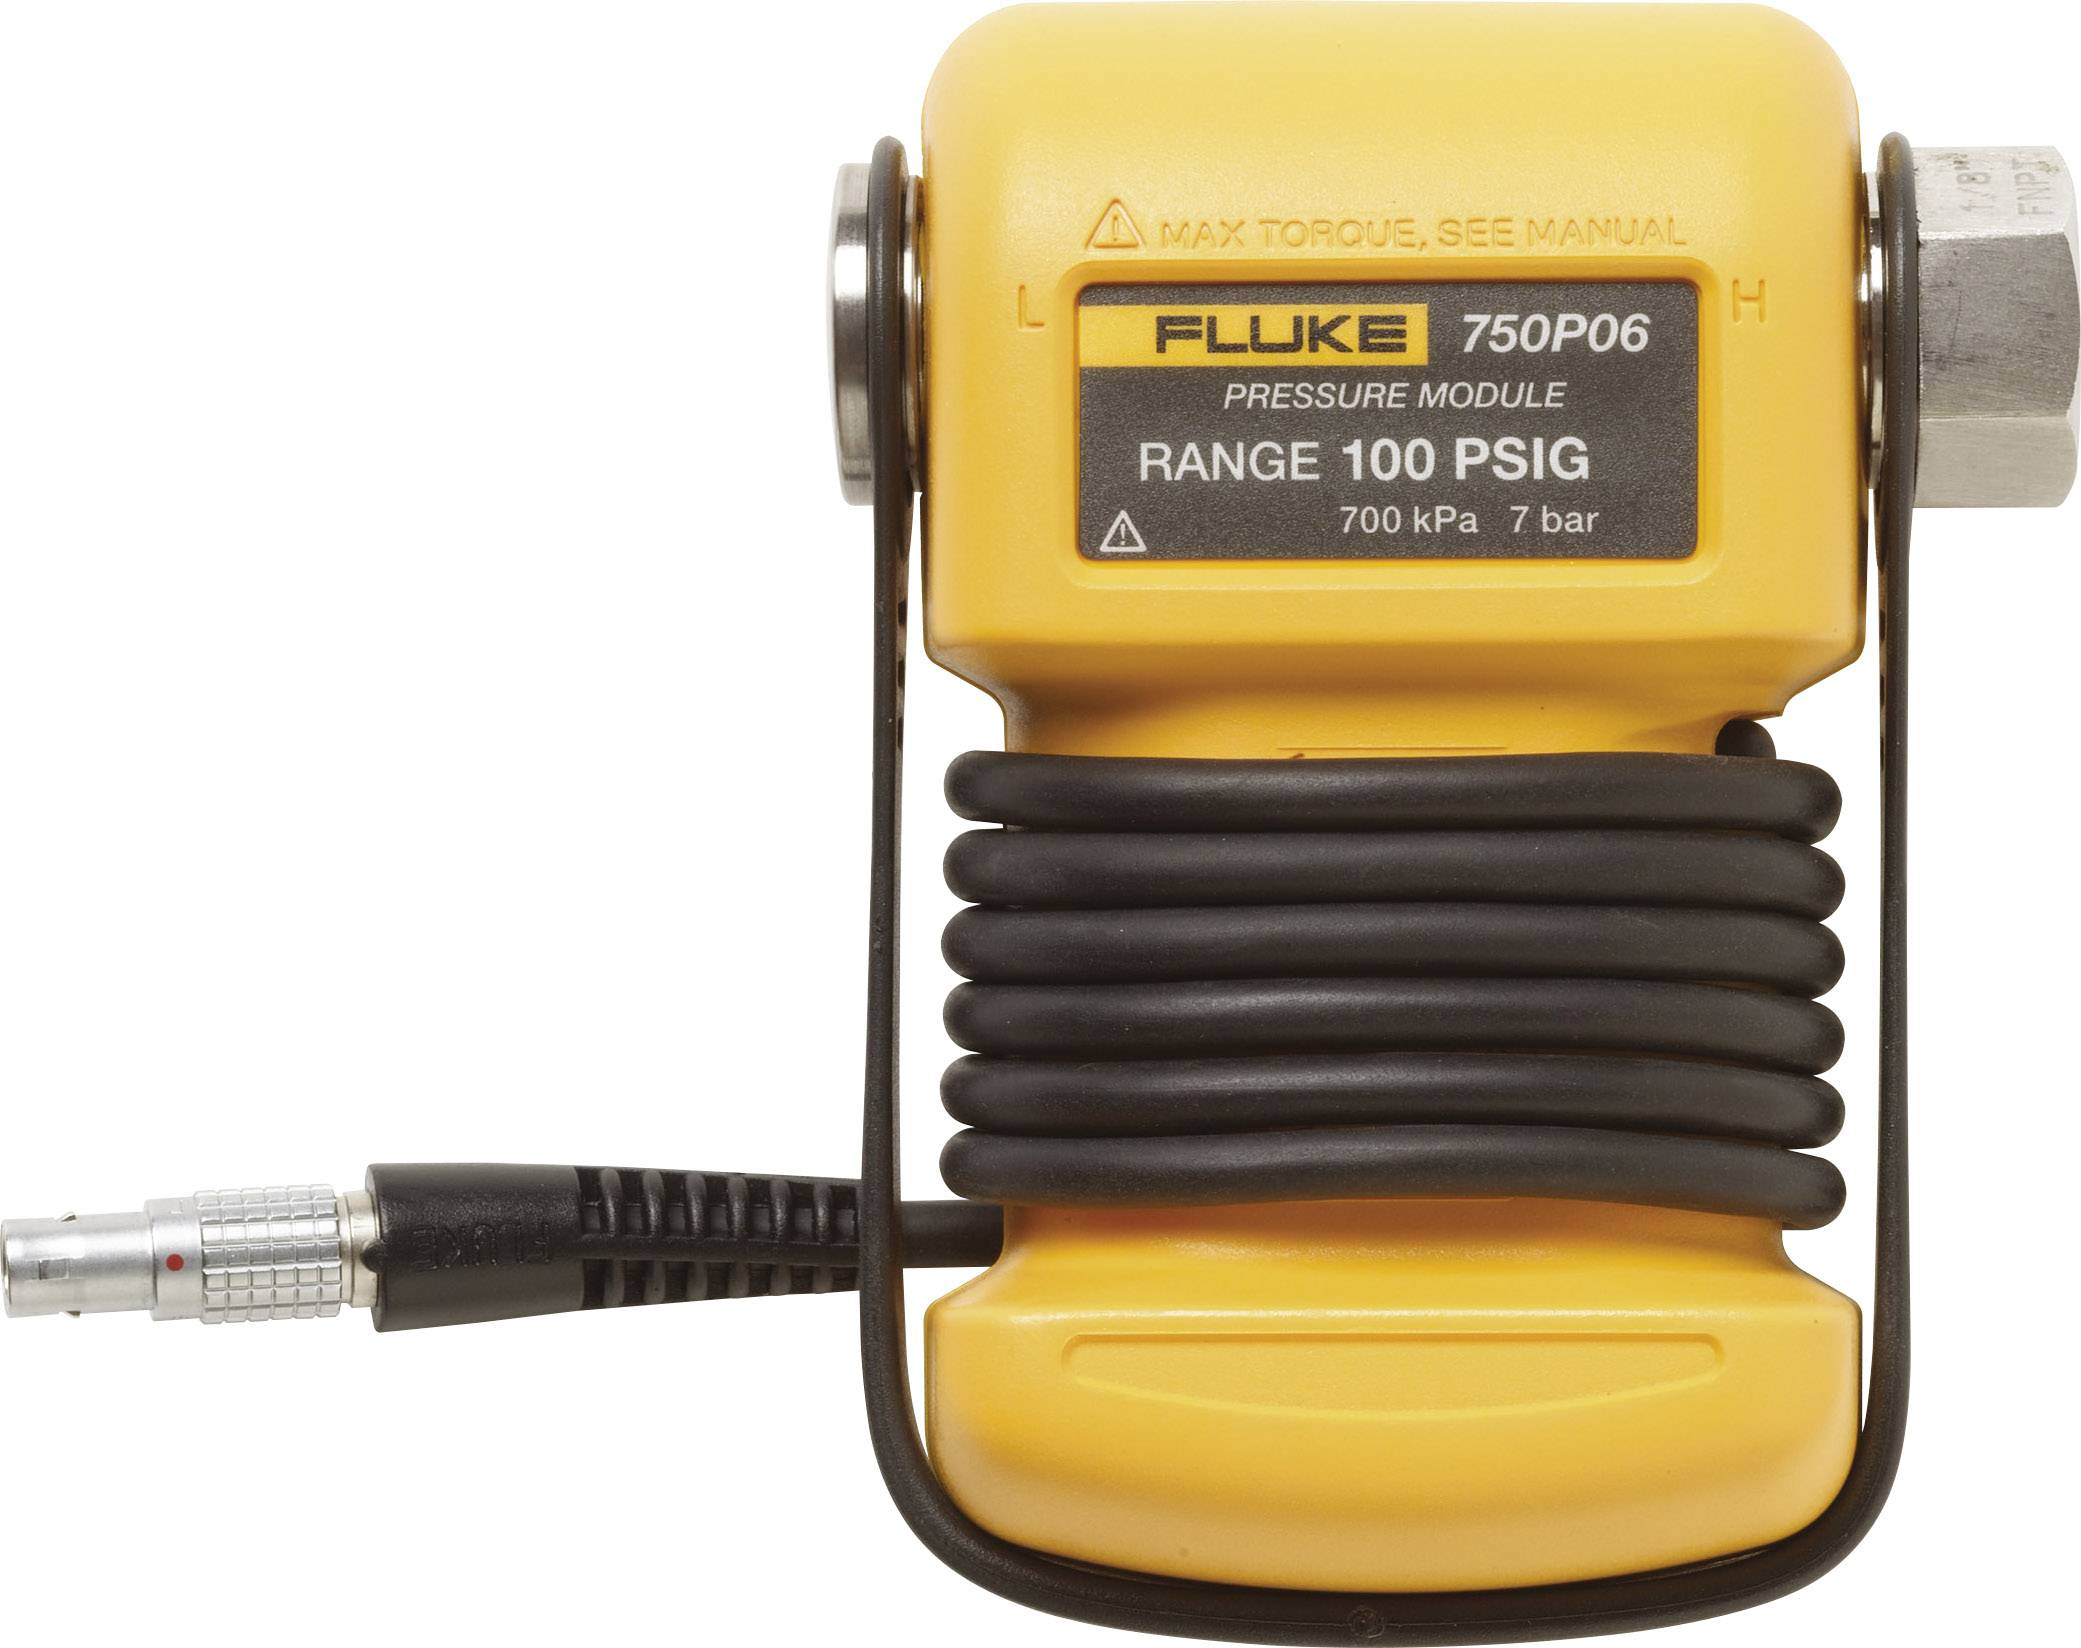 Tlakový modul Fluke 750P06